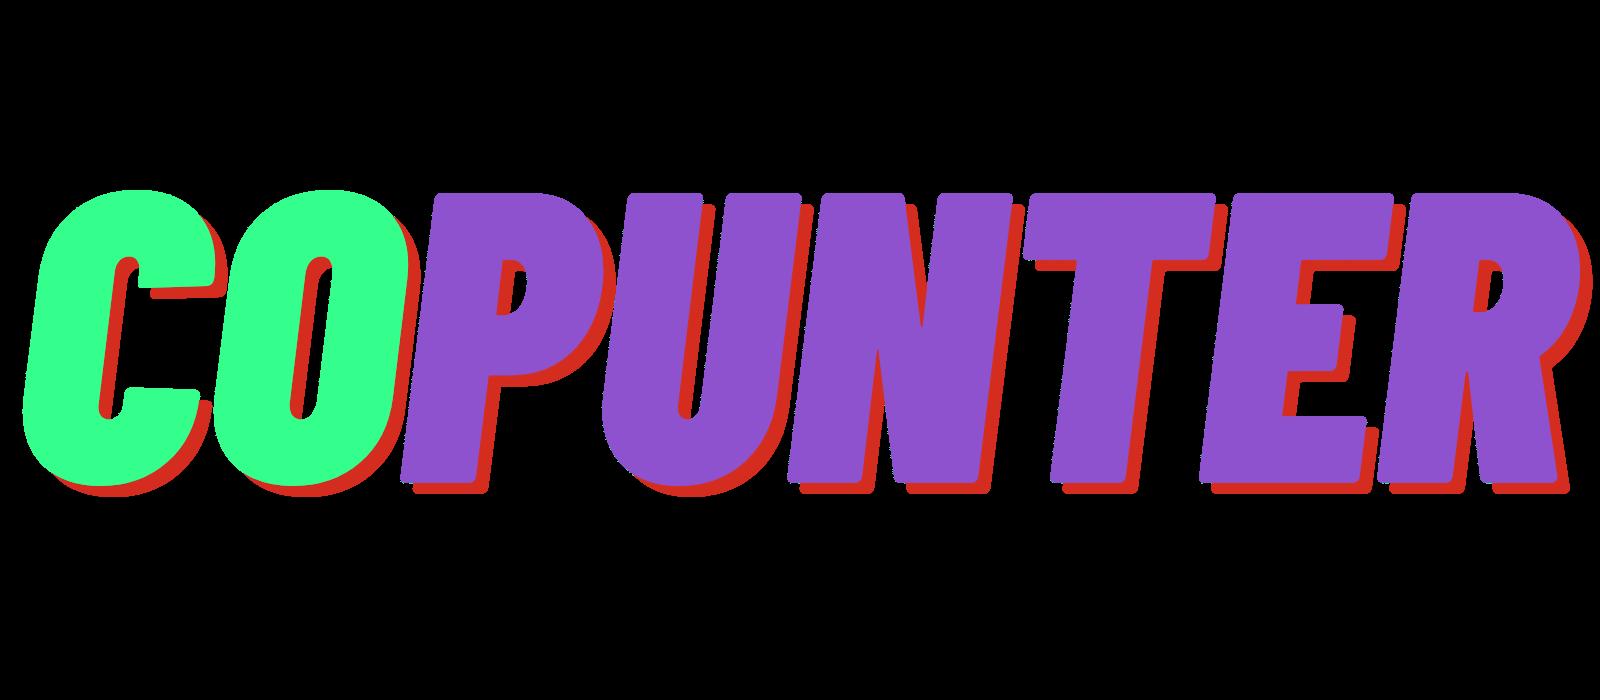 copunter.com